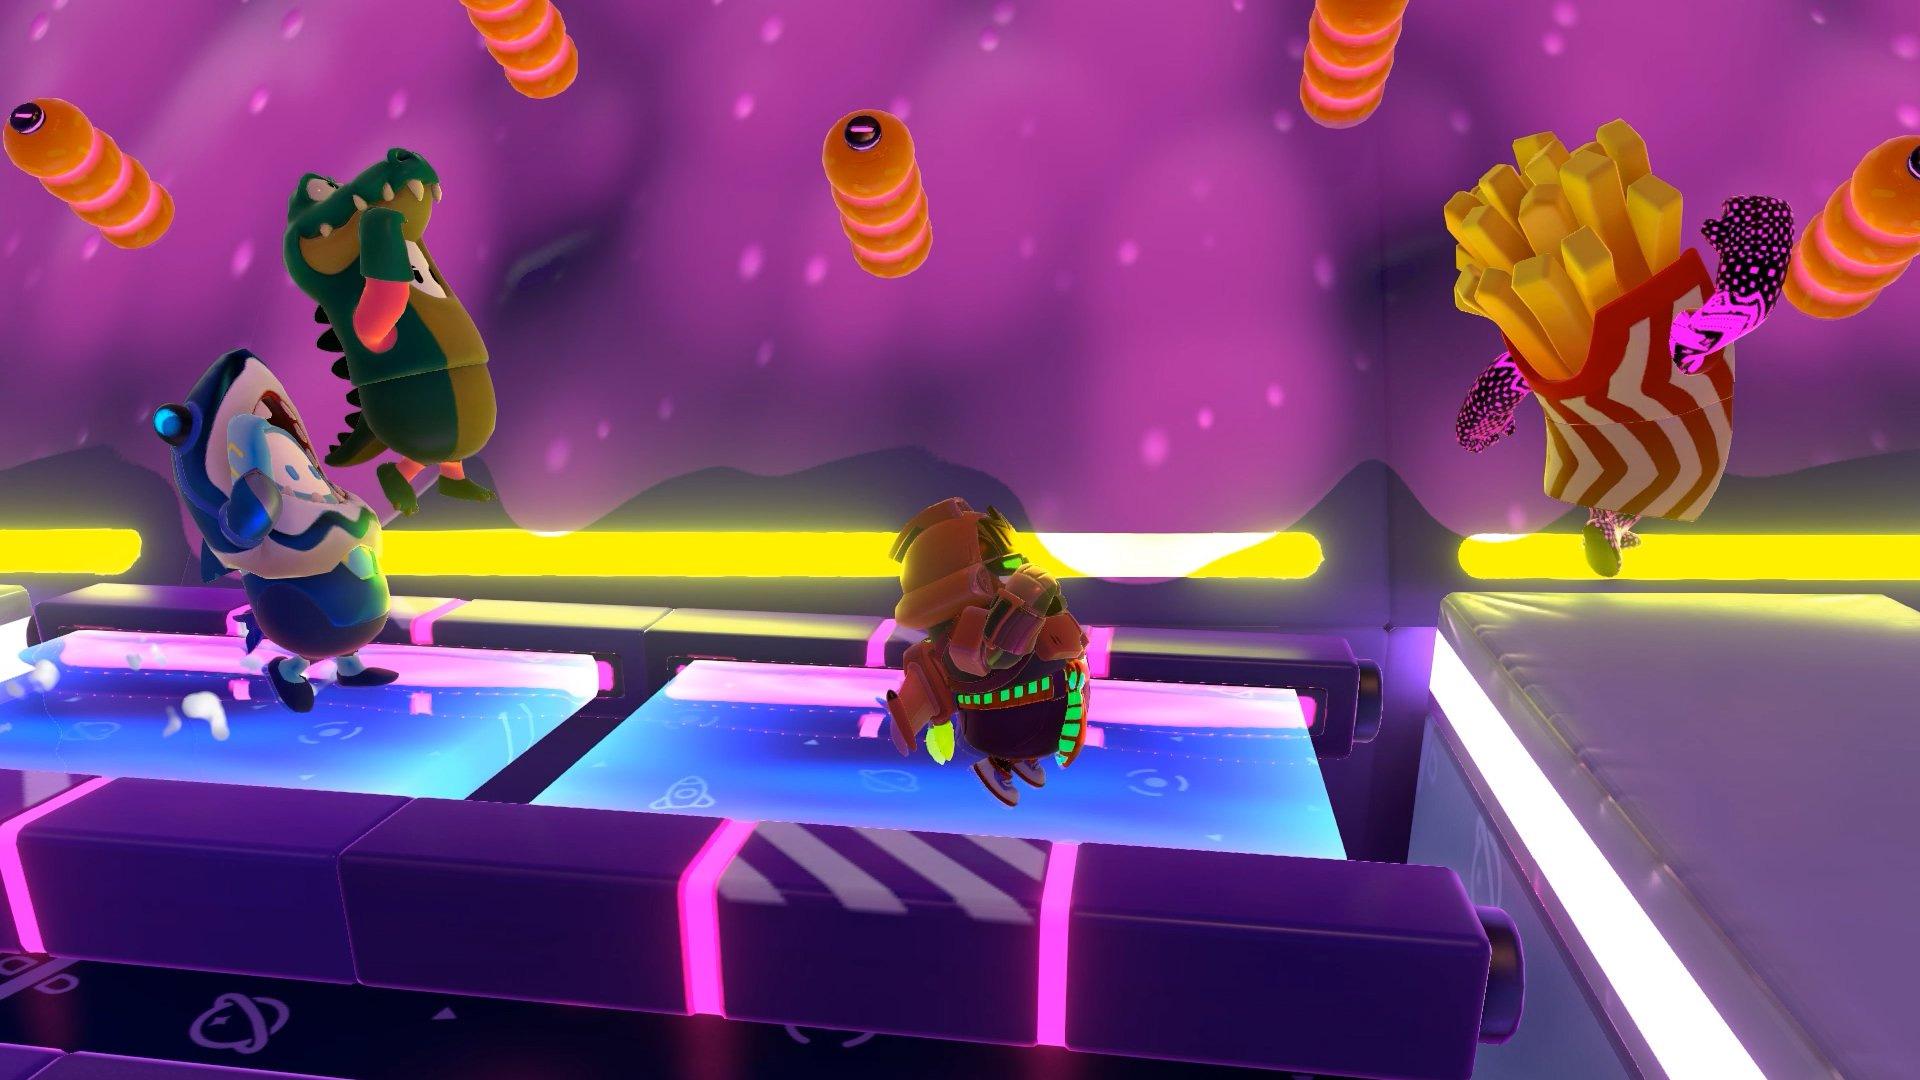 Fall Guys is getting The Slimescraper, a successor to Slime Climb, on May 13 screenshot